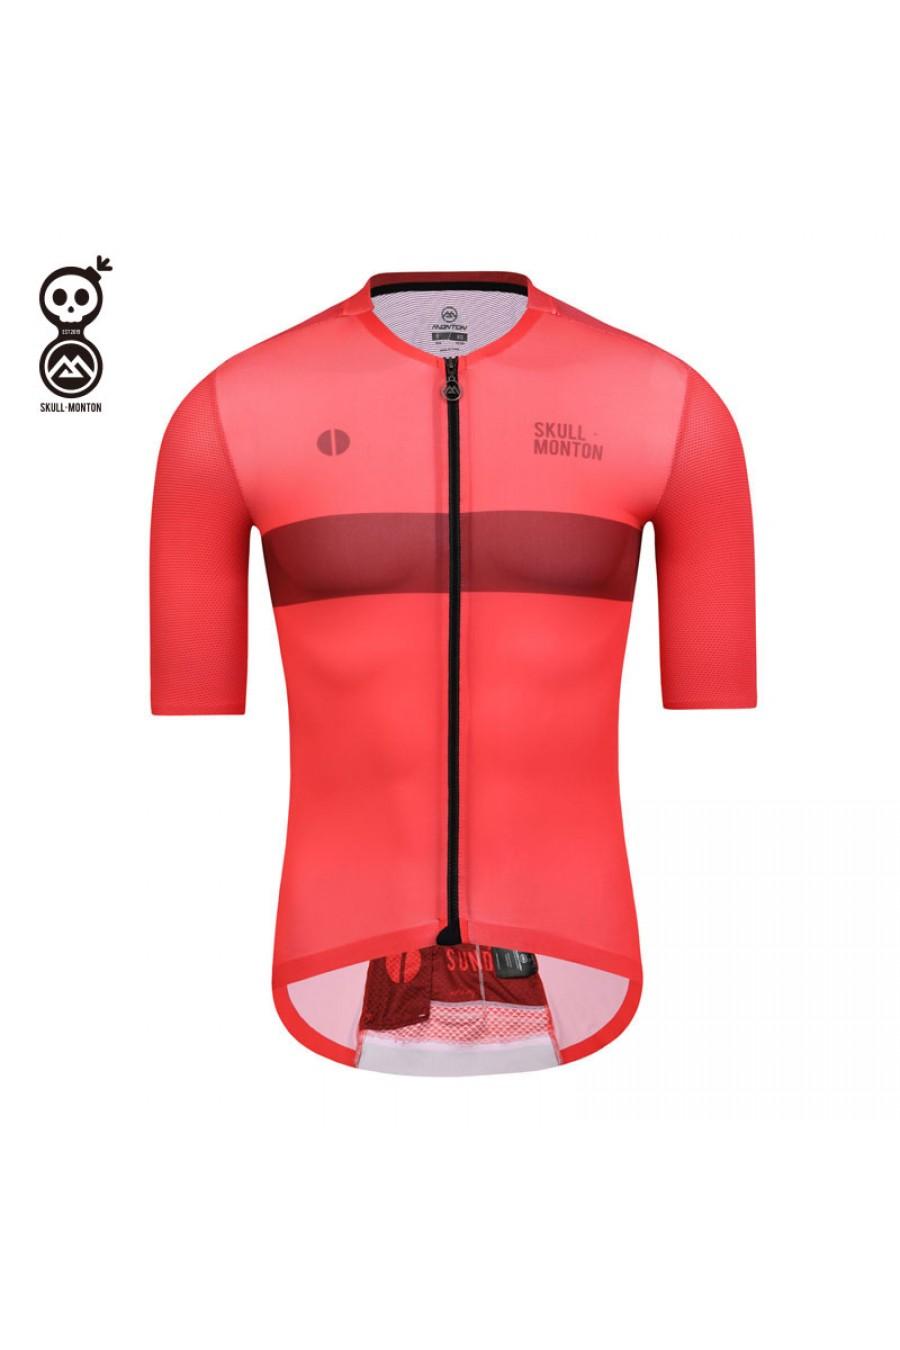 MuddyFox Men/'s Cycling Jersey Red